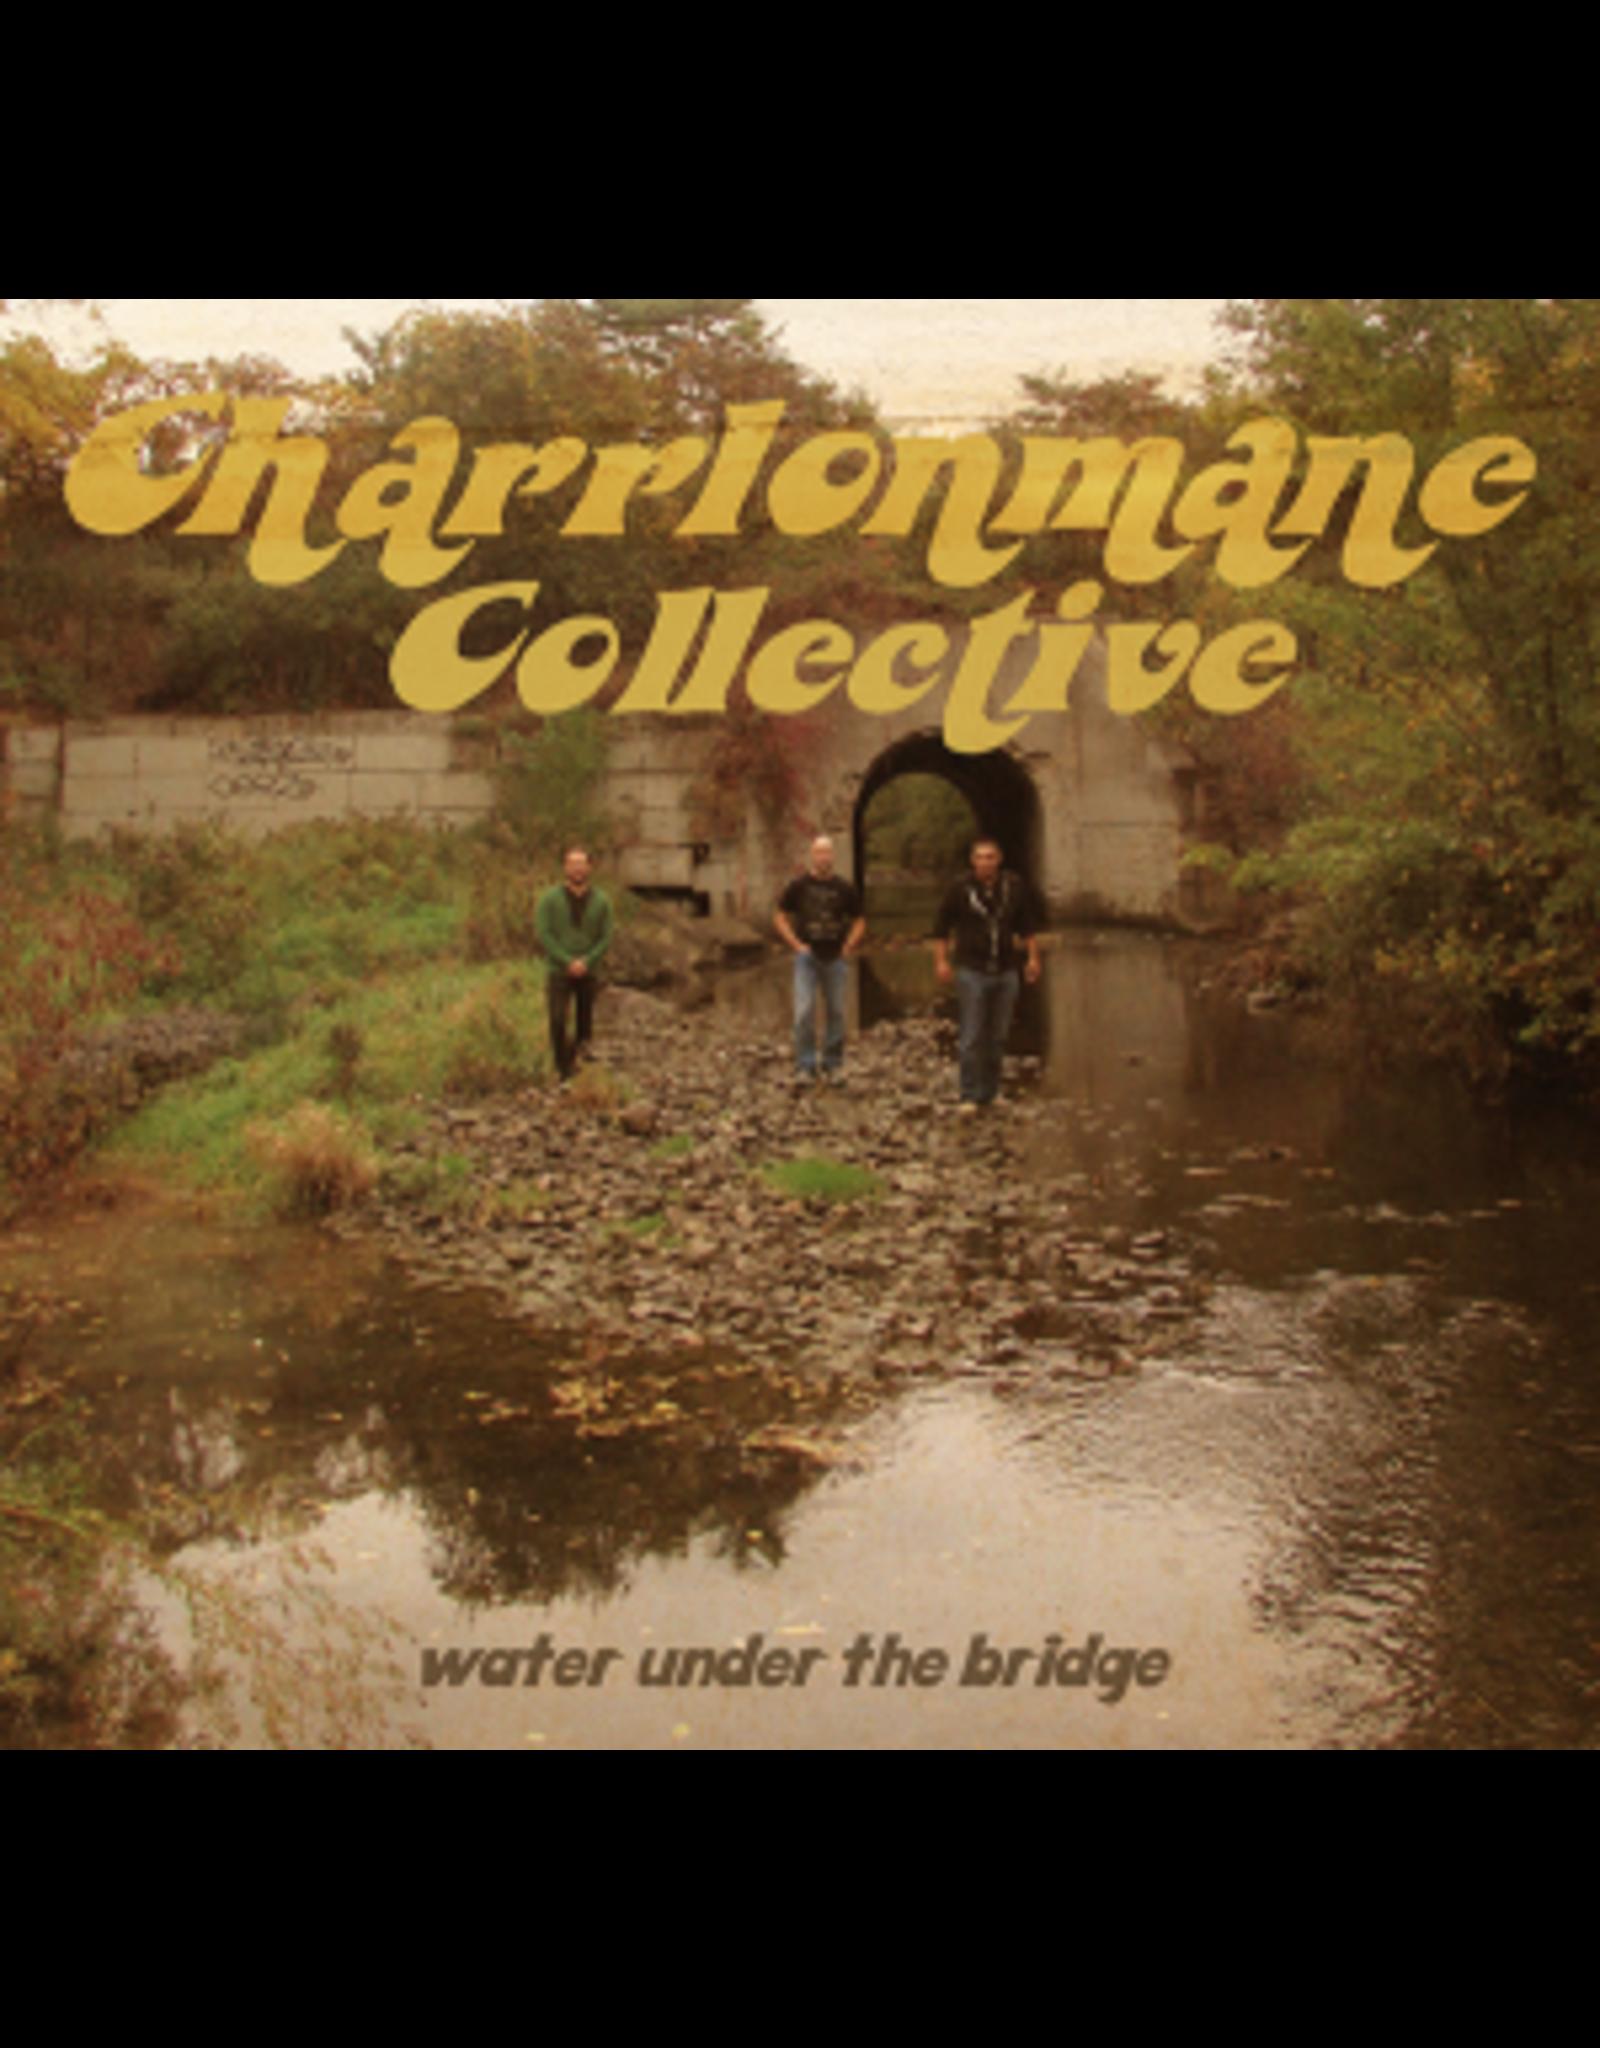 Charrlonmane Collective - Water Under The Bridge CD